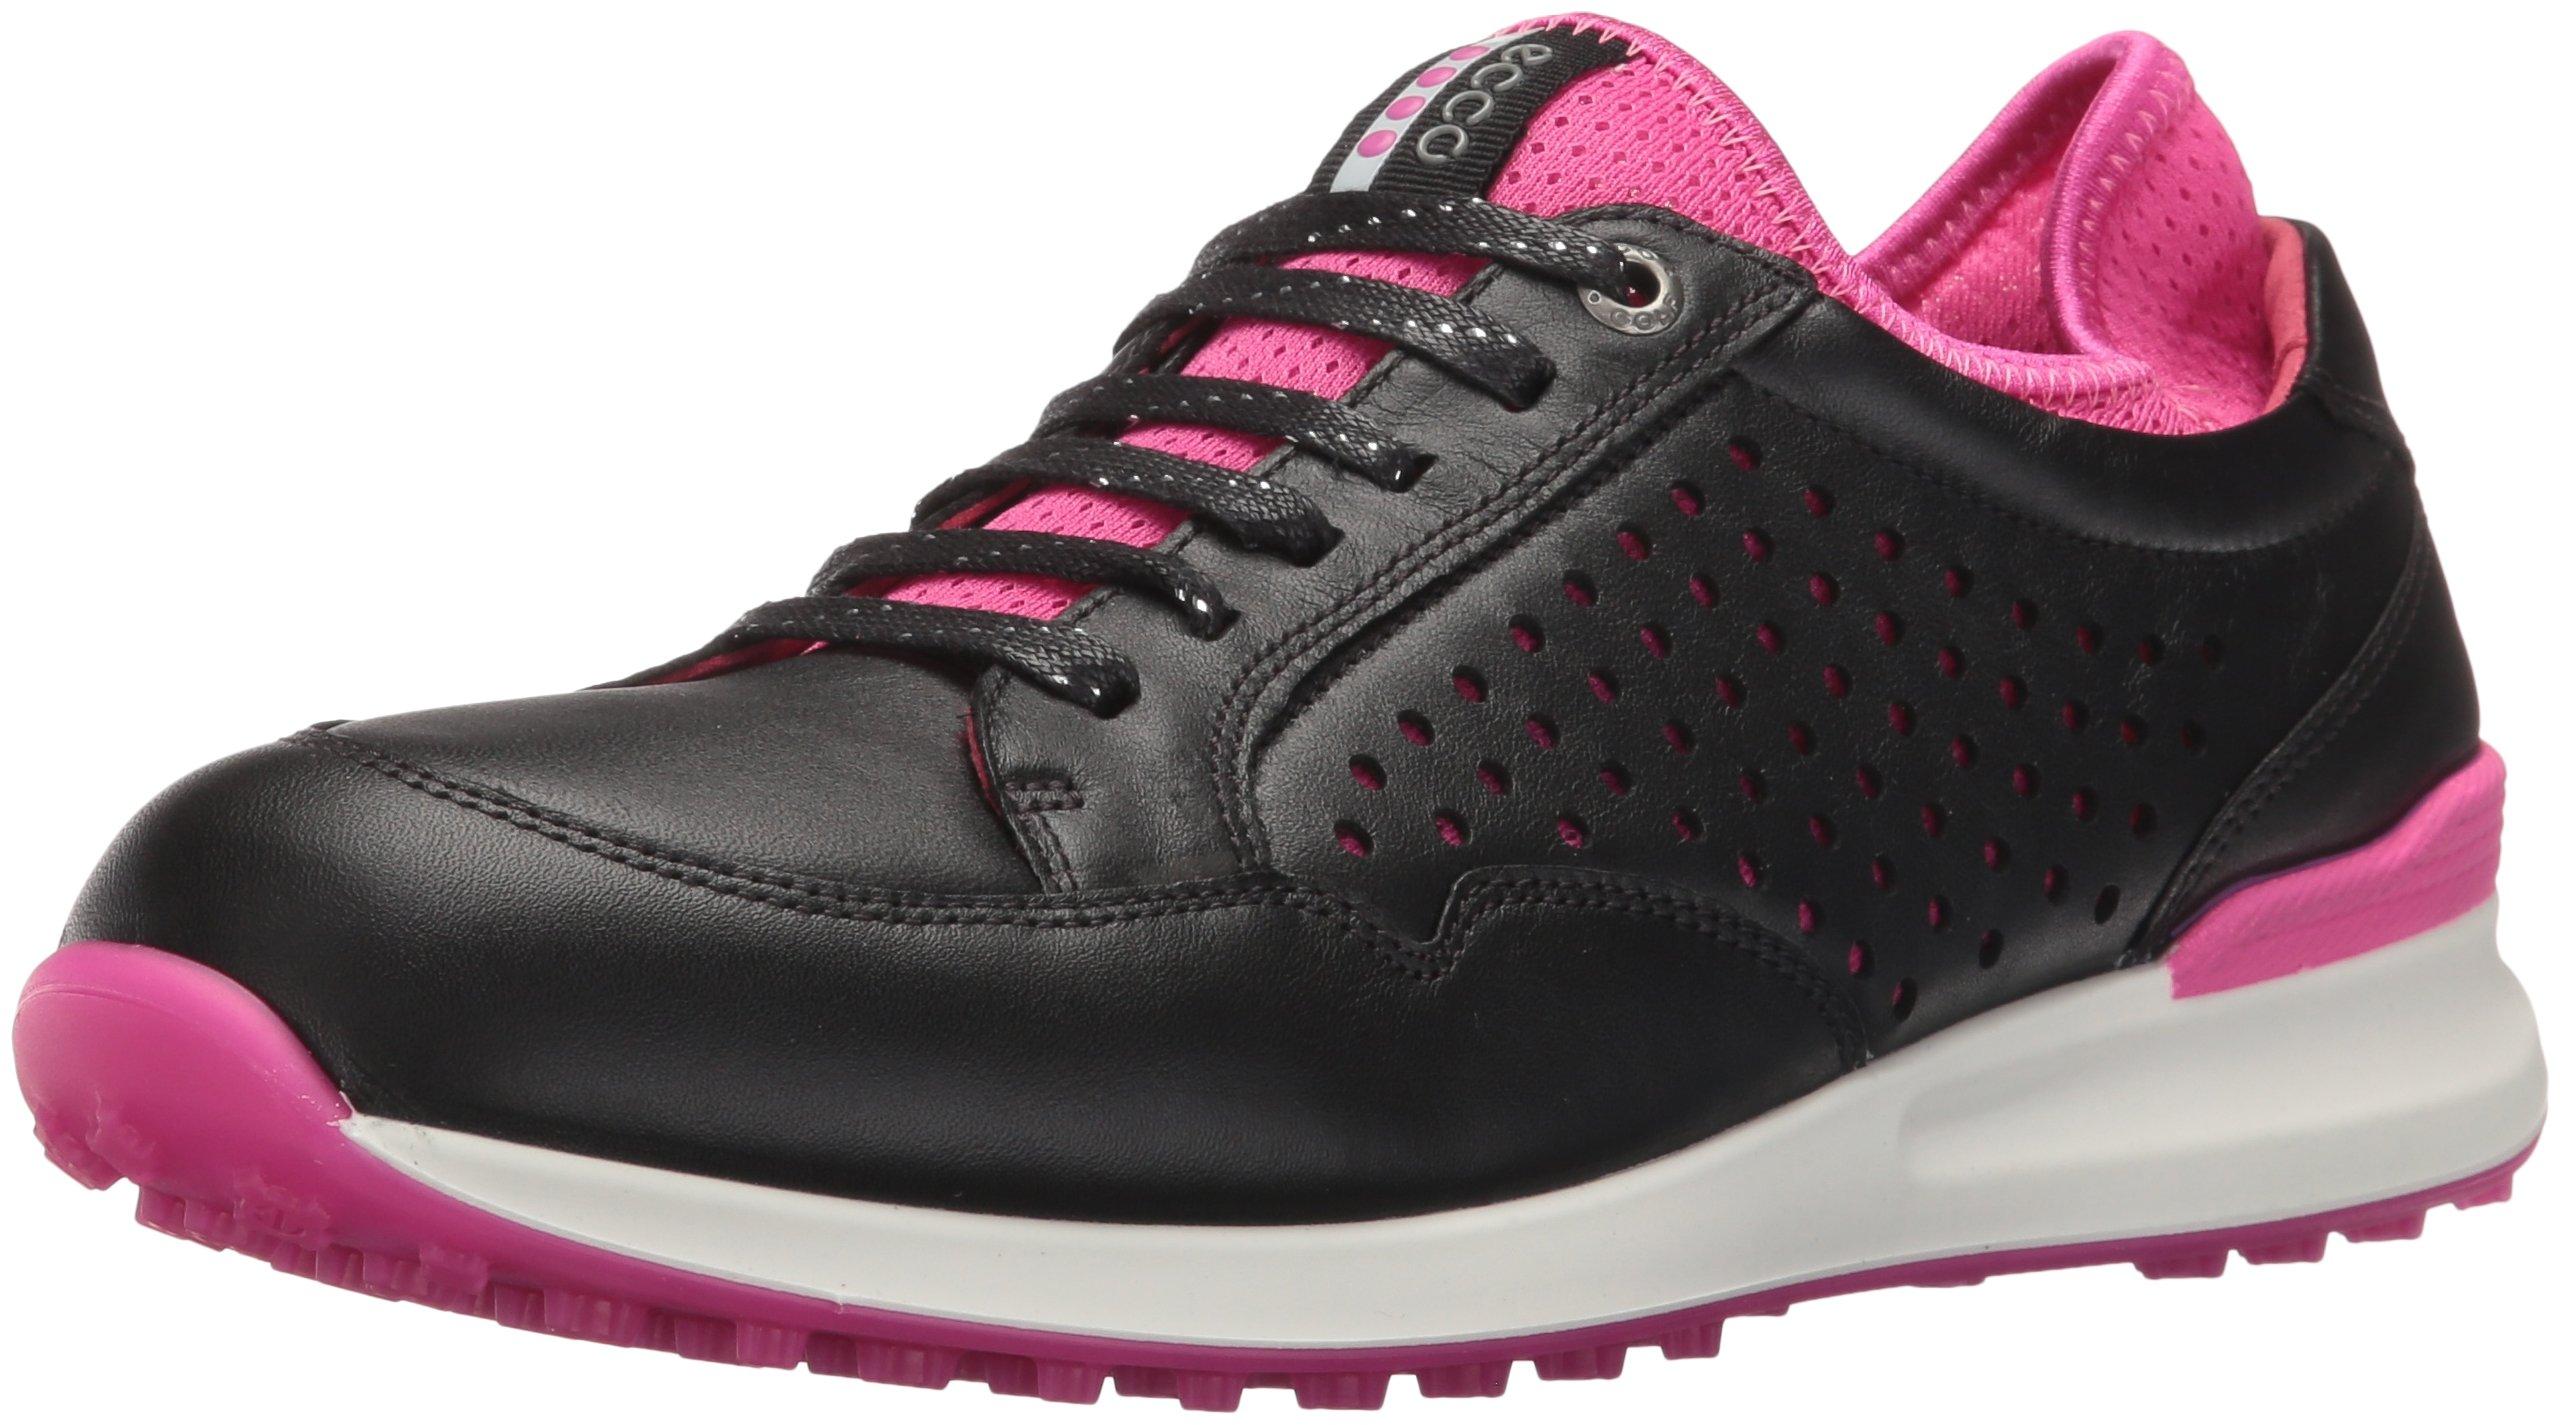 ECCO Women's Speed Hybrid Golf Shoe, Black/Raspberry, 41 EU/10-10.5 M US